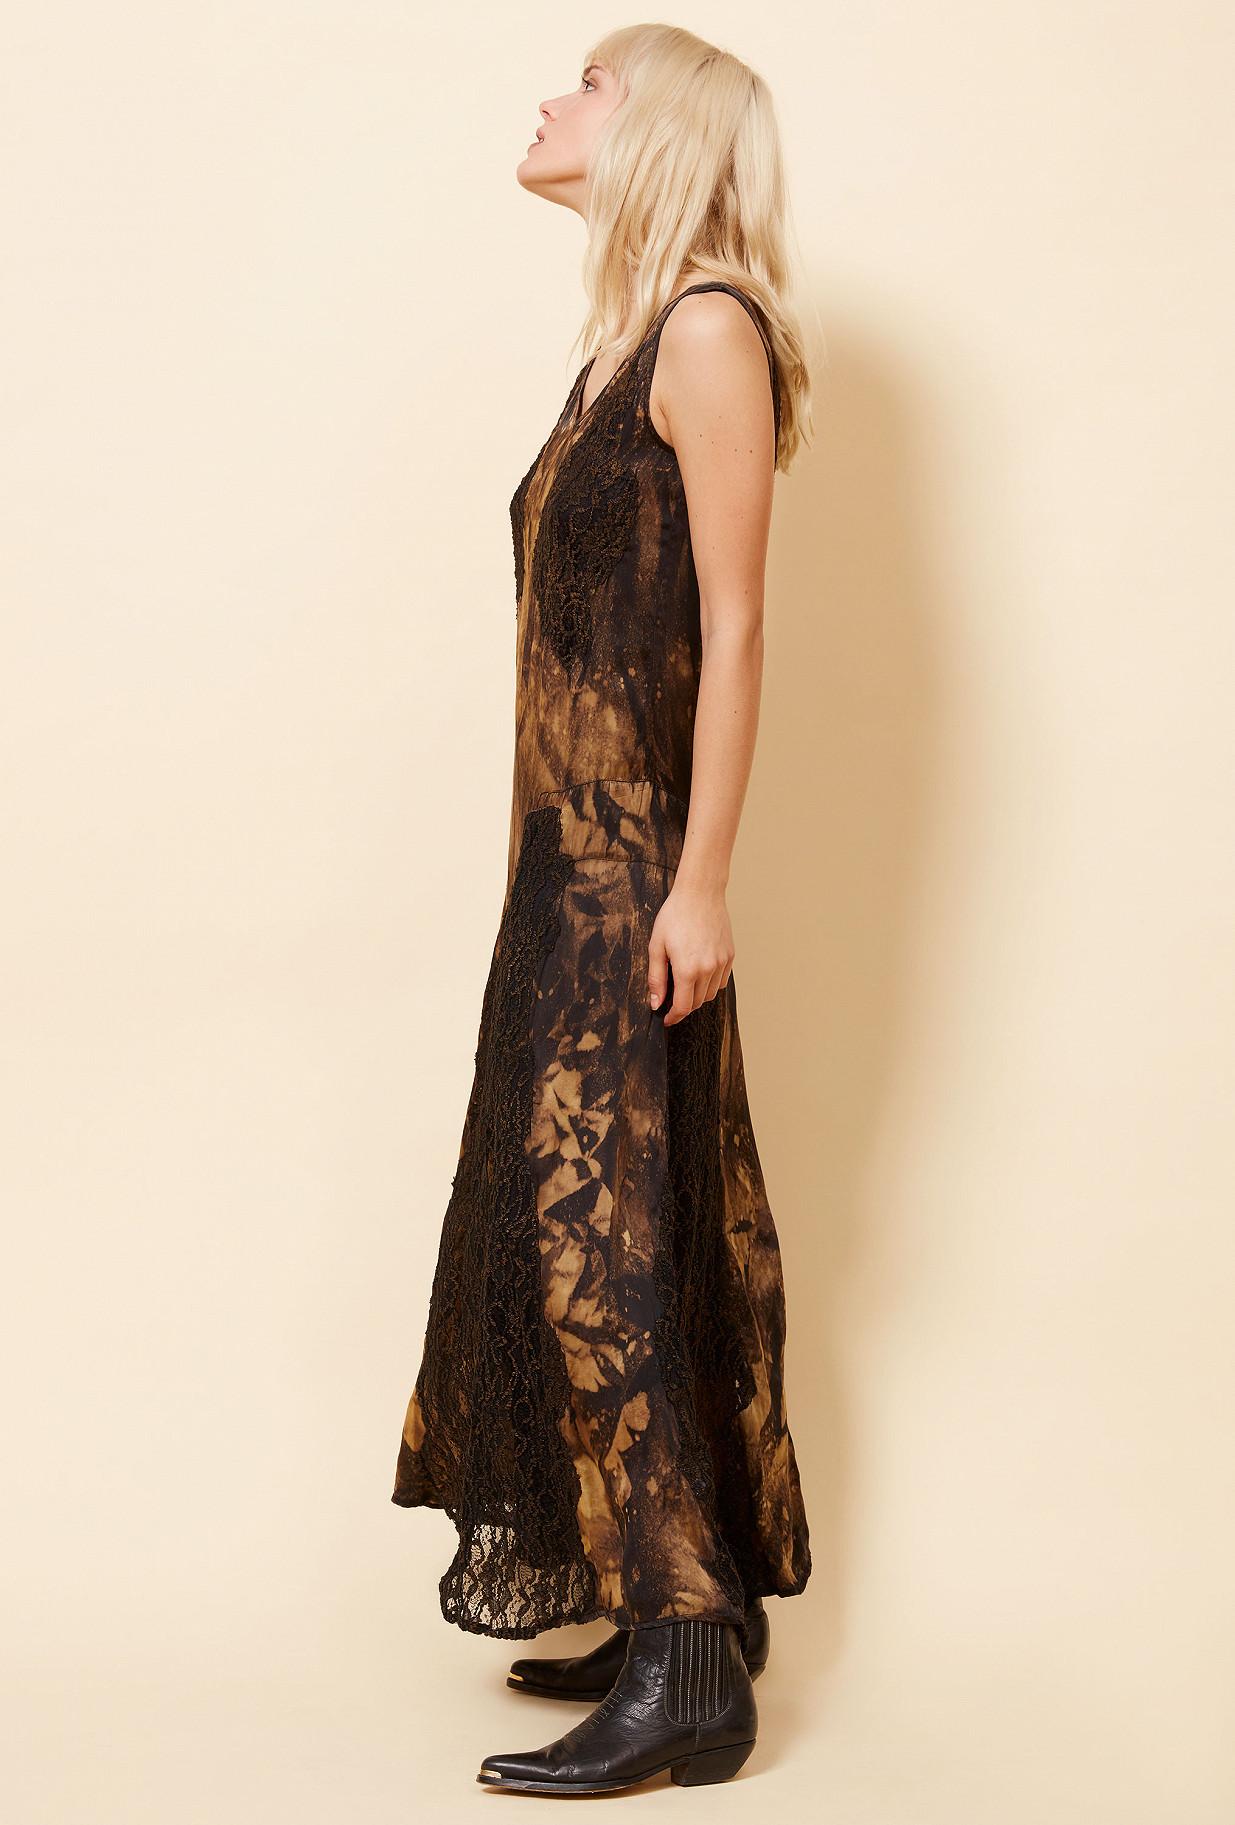 Robe Noir Garance dore Mes Demoiselles Paris